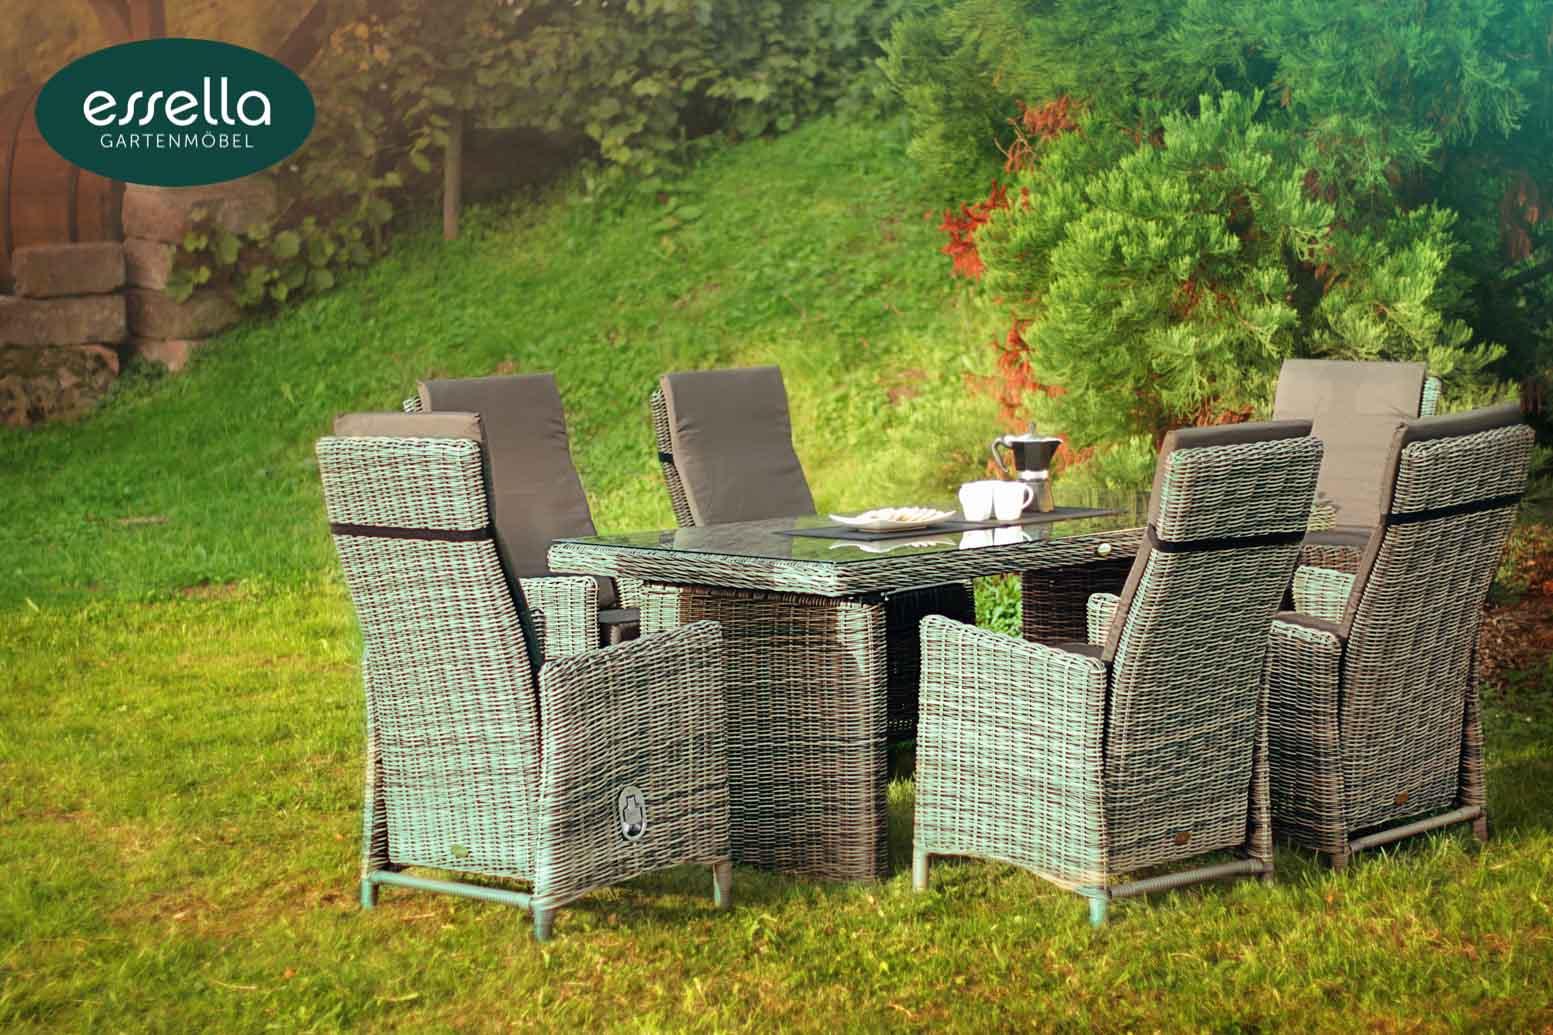 sitzgruppe rom 6 personen rundgeflecht. Black Bedroom Furniture Sets. Home Design Ideas